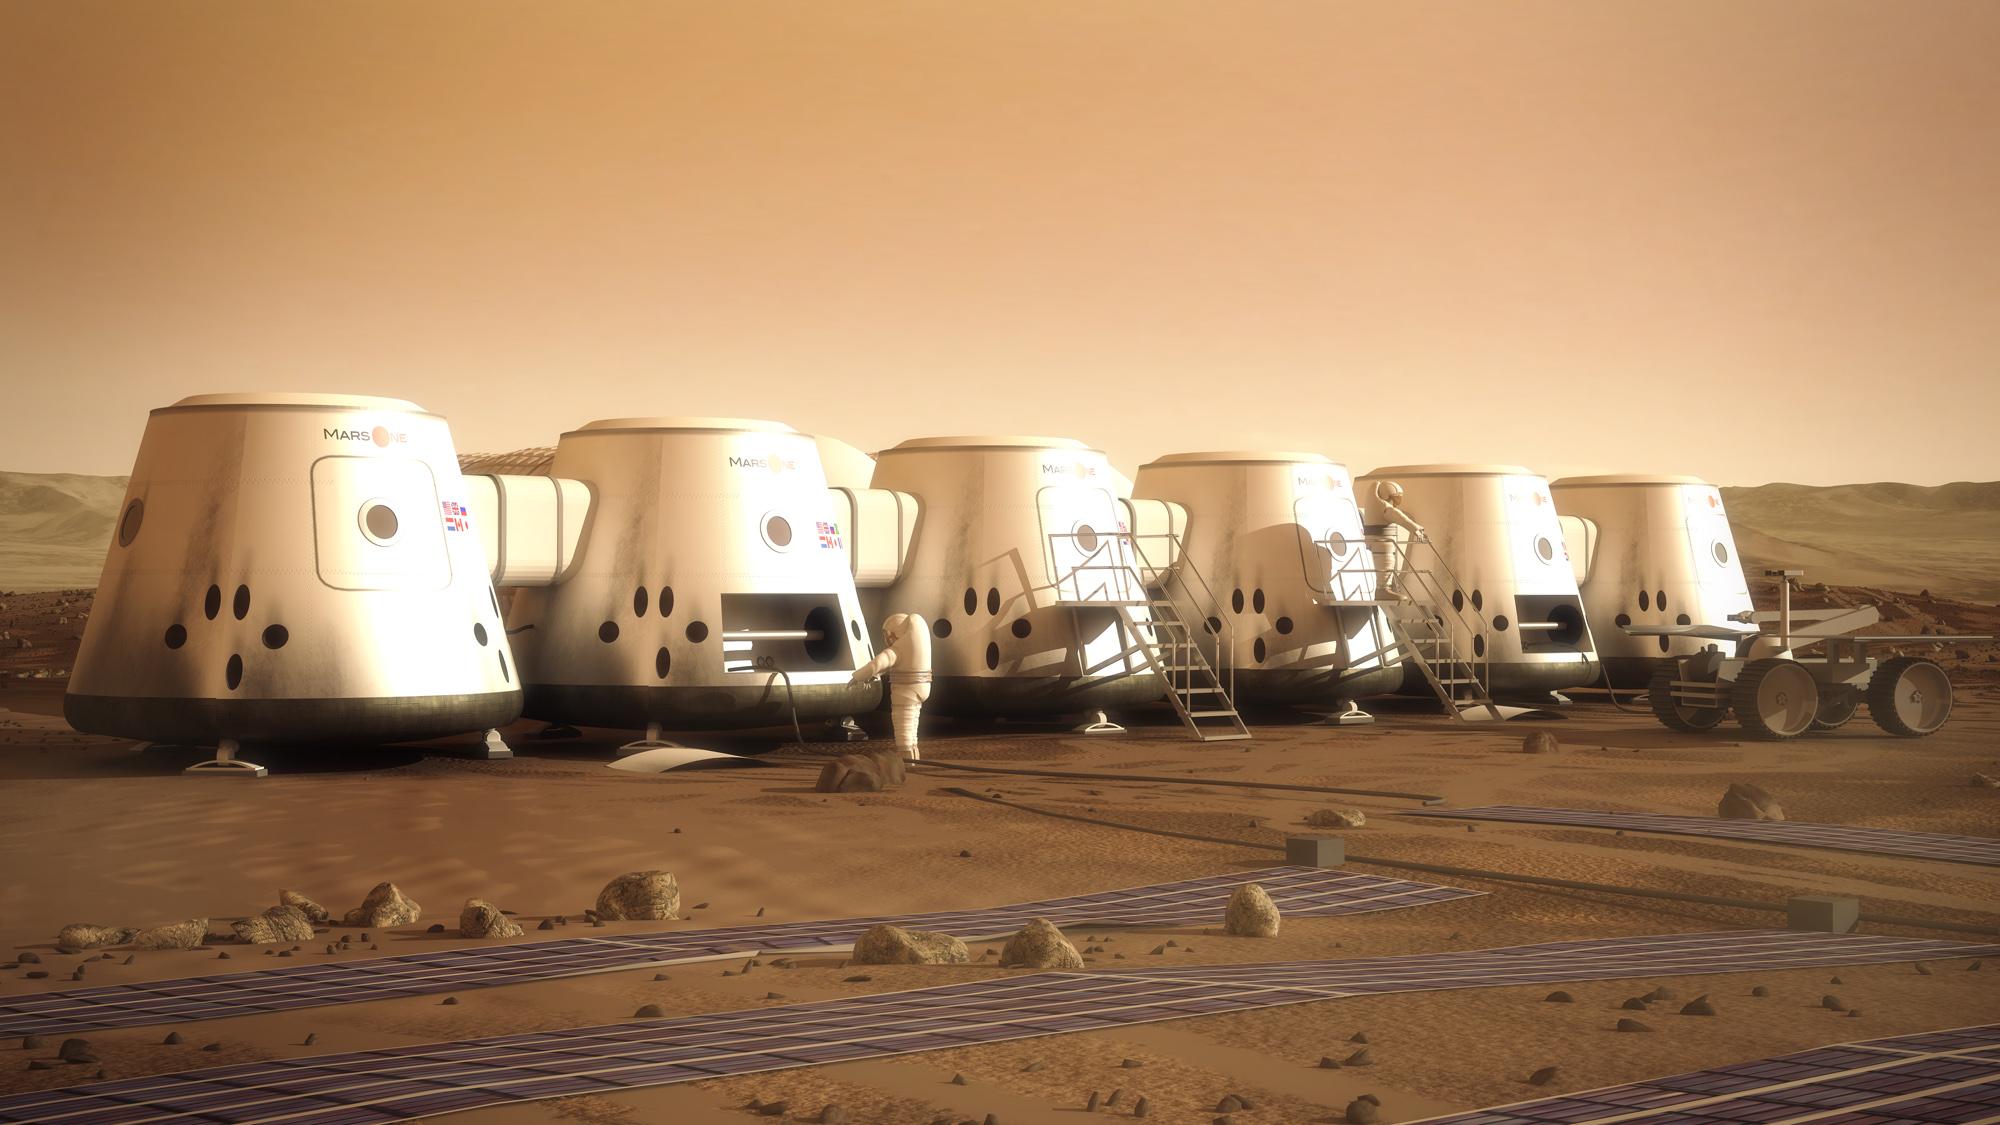 mars-one-colony-astronauts-2.jpg